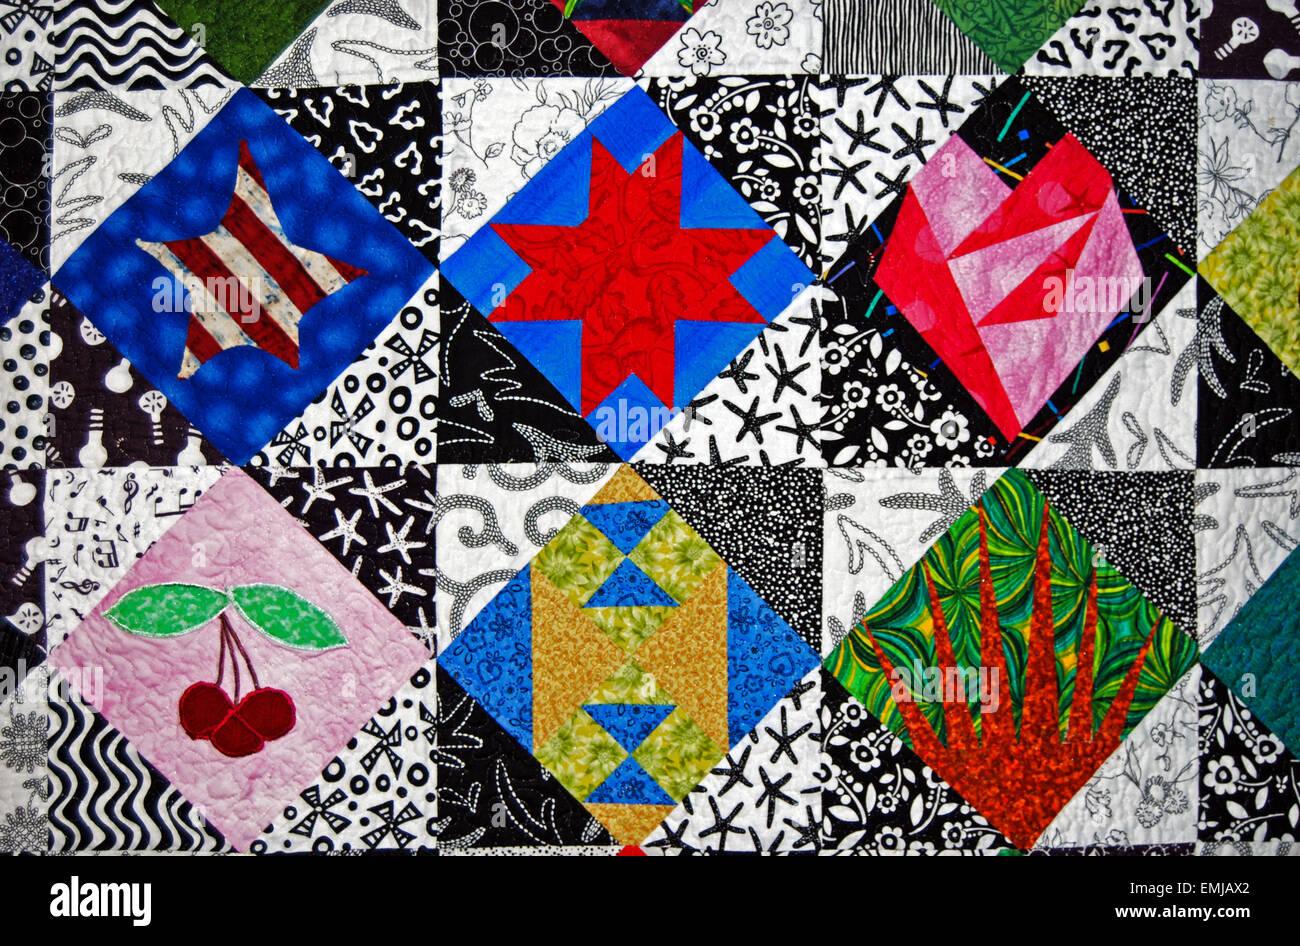 Patchwork Quilt Sewing Stockfotos & Patchwork Quilt Sewing Bilder ...